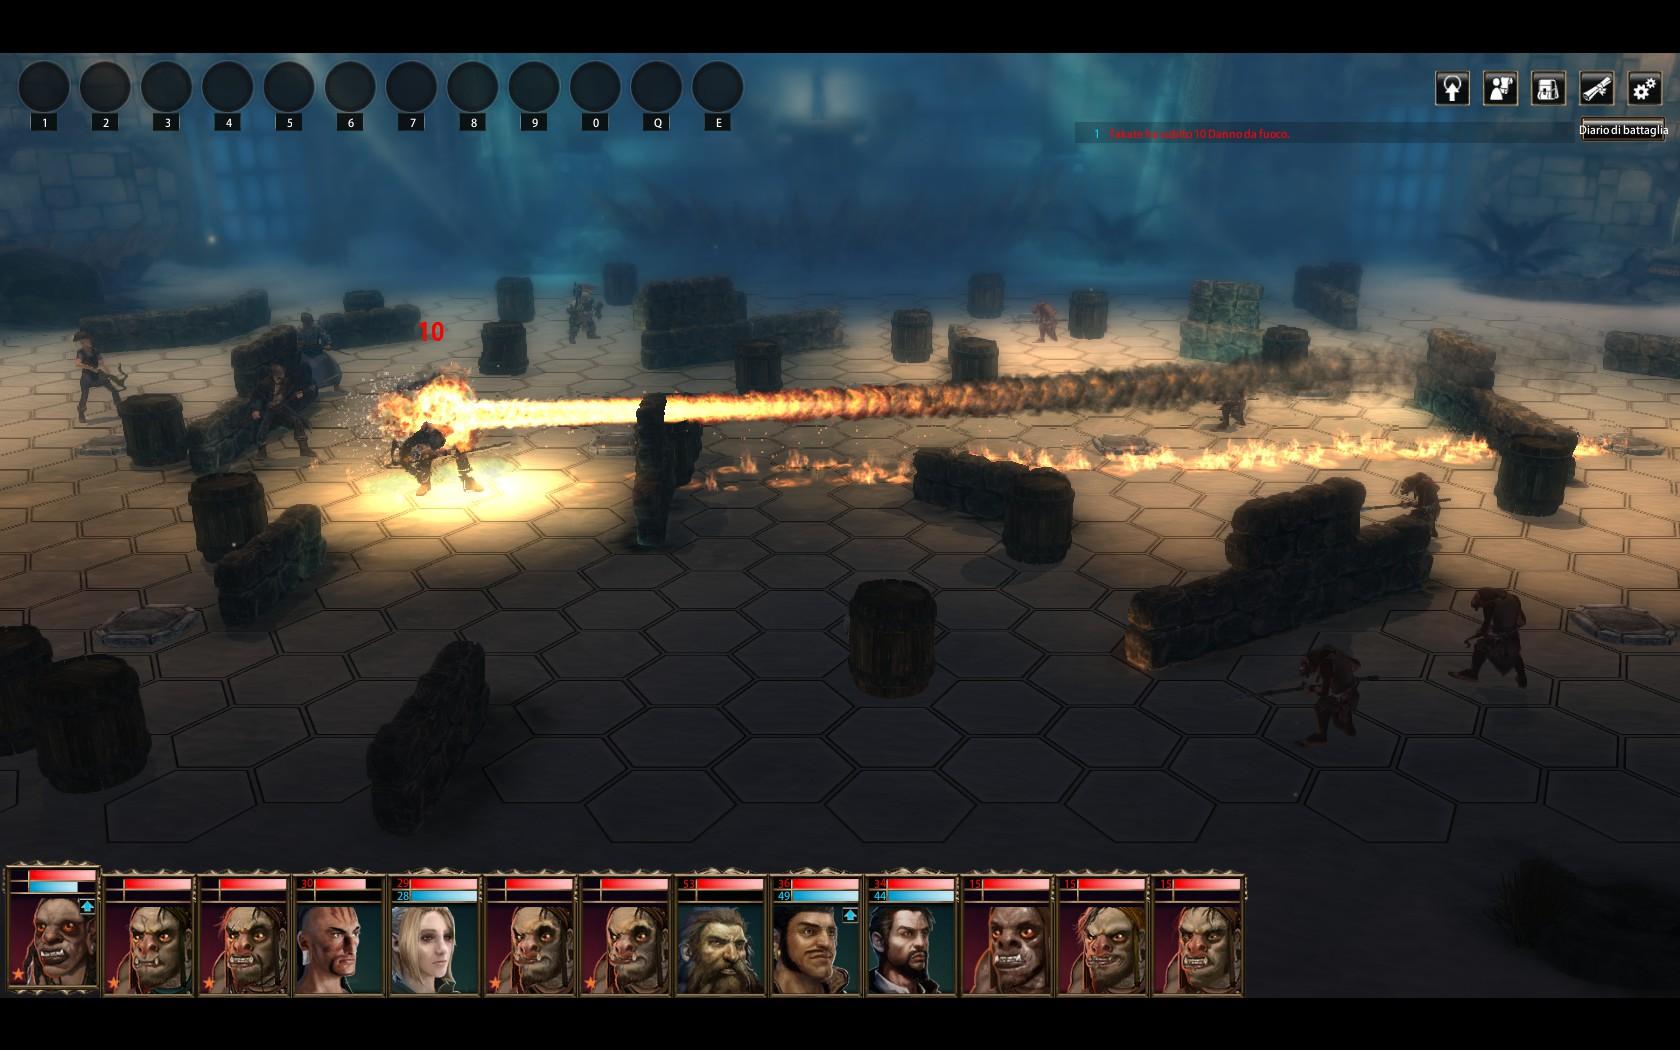 Blackguards battaglia